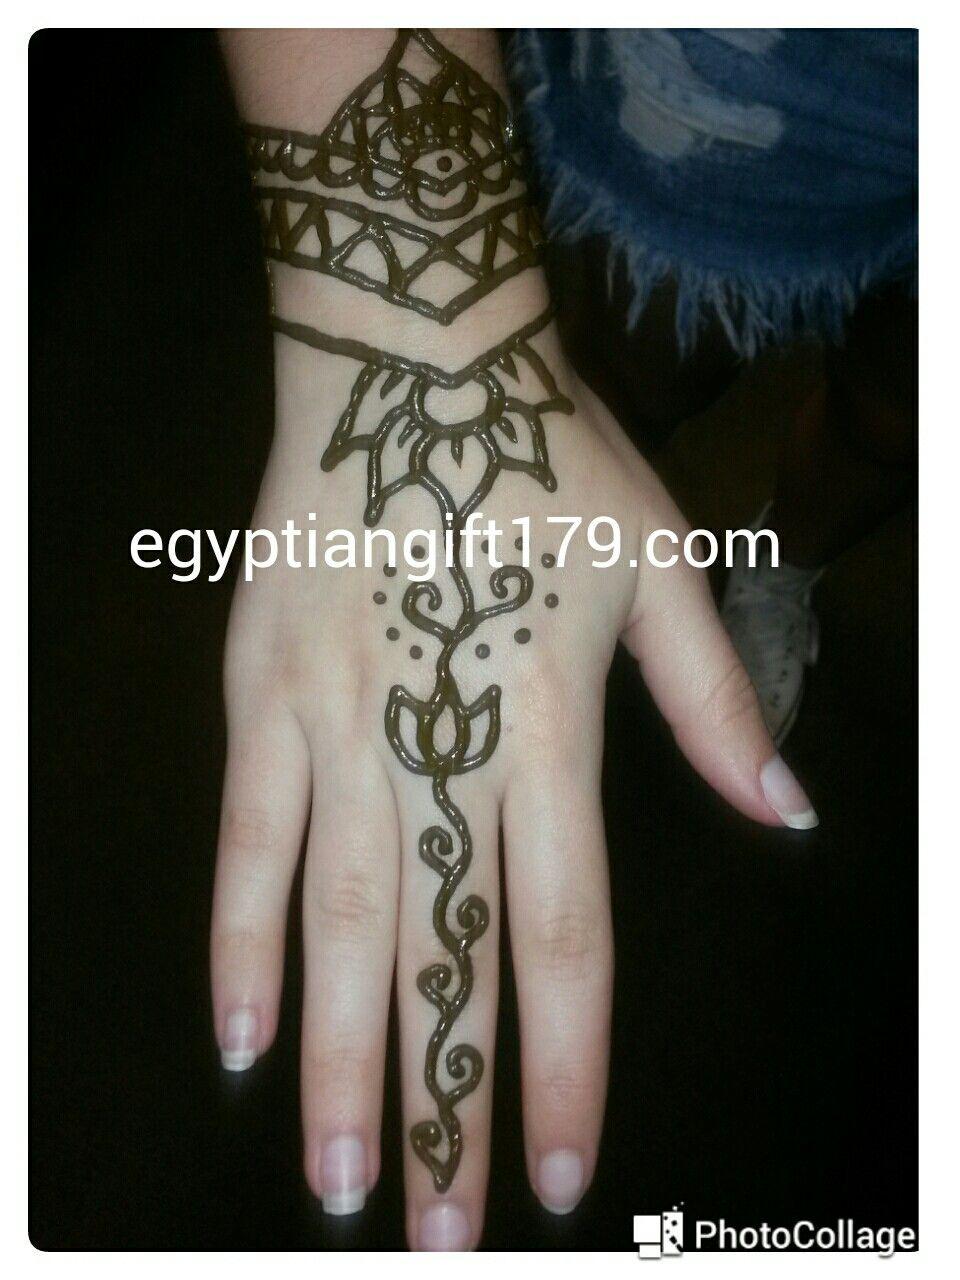 Egyptian gift corner henna shop henna kit henna